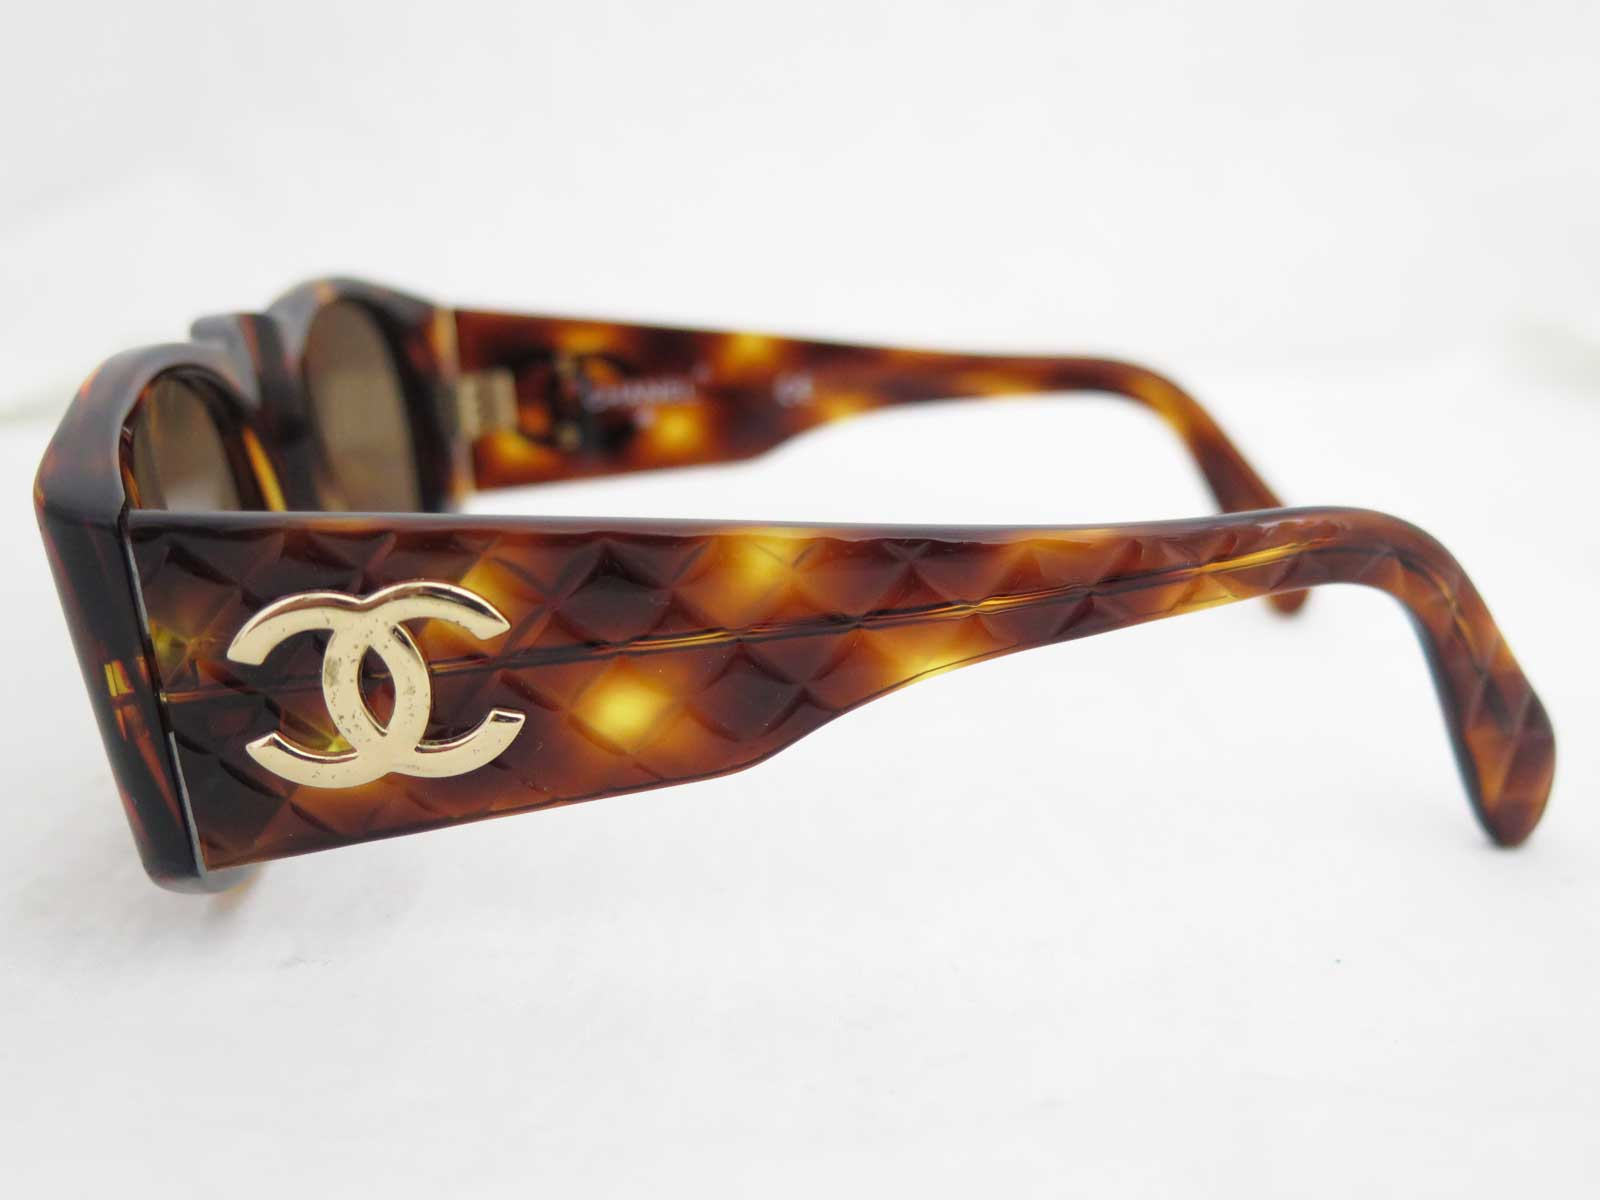 964b127915 Auth CHANEL CC Logo Matelasse Brown Goldtone Sunglasses w Case ...